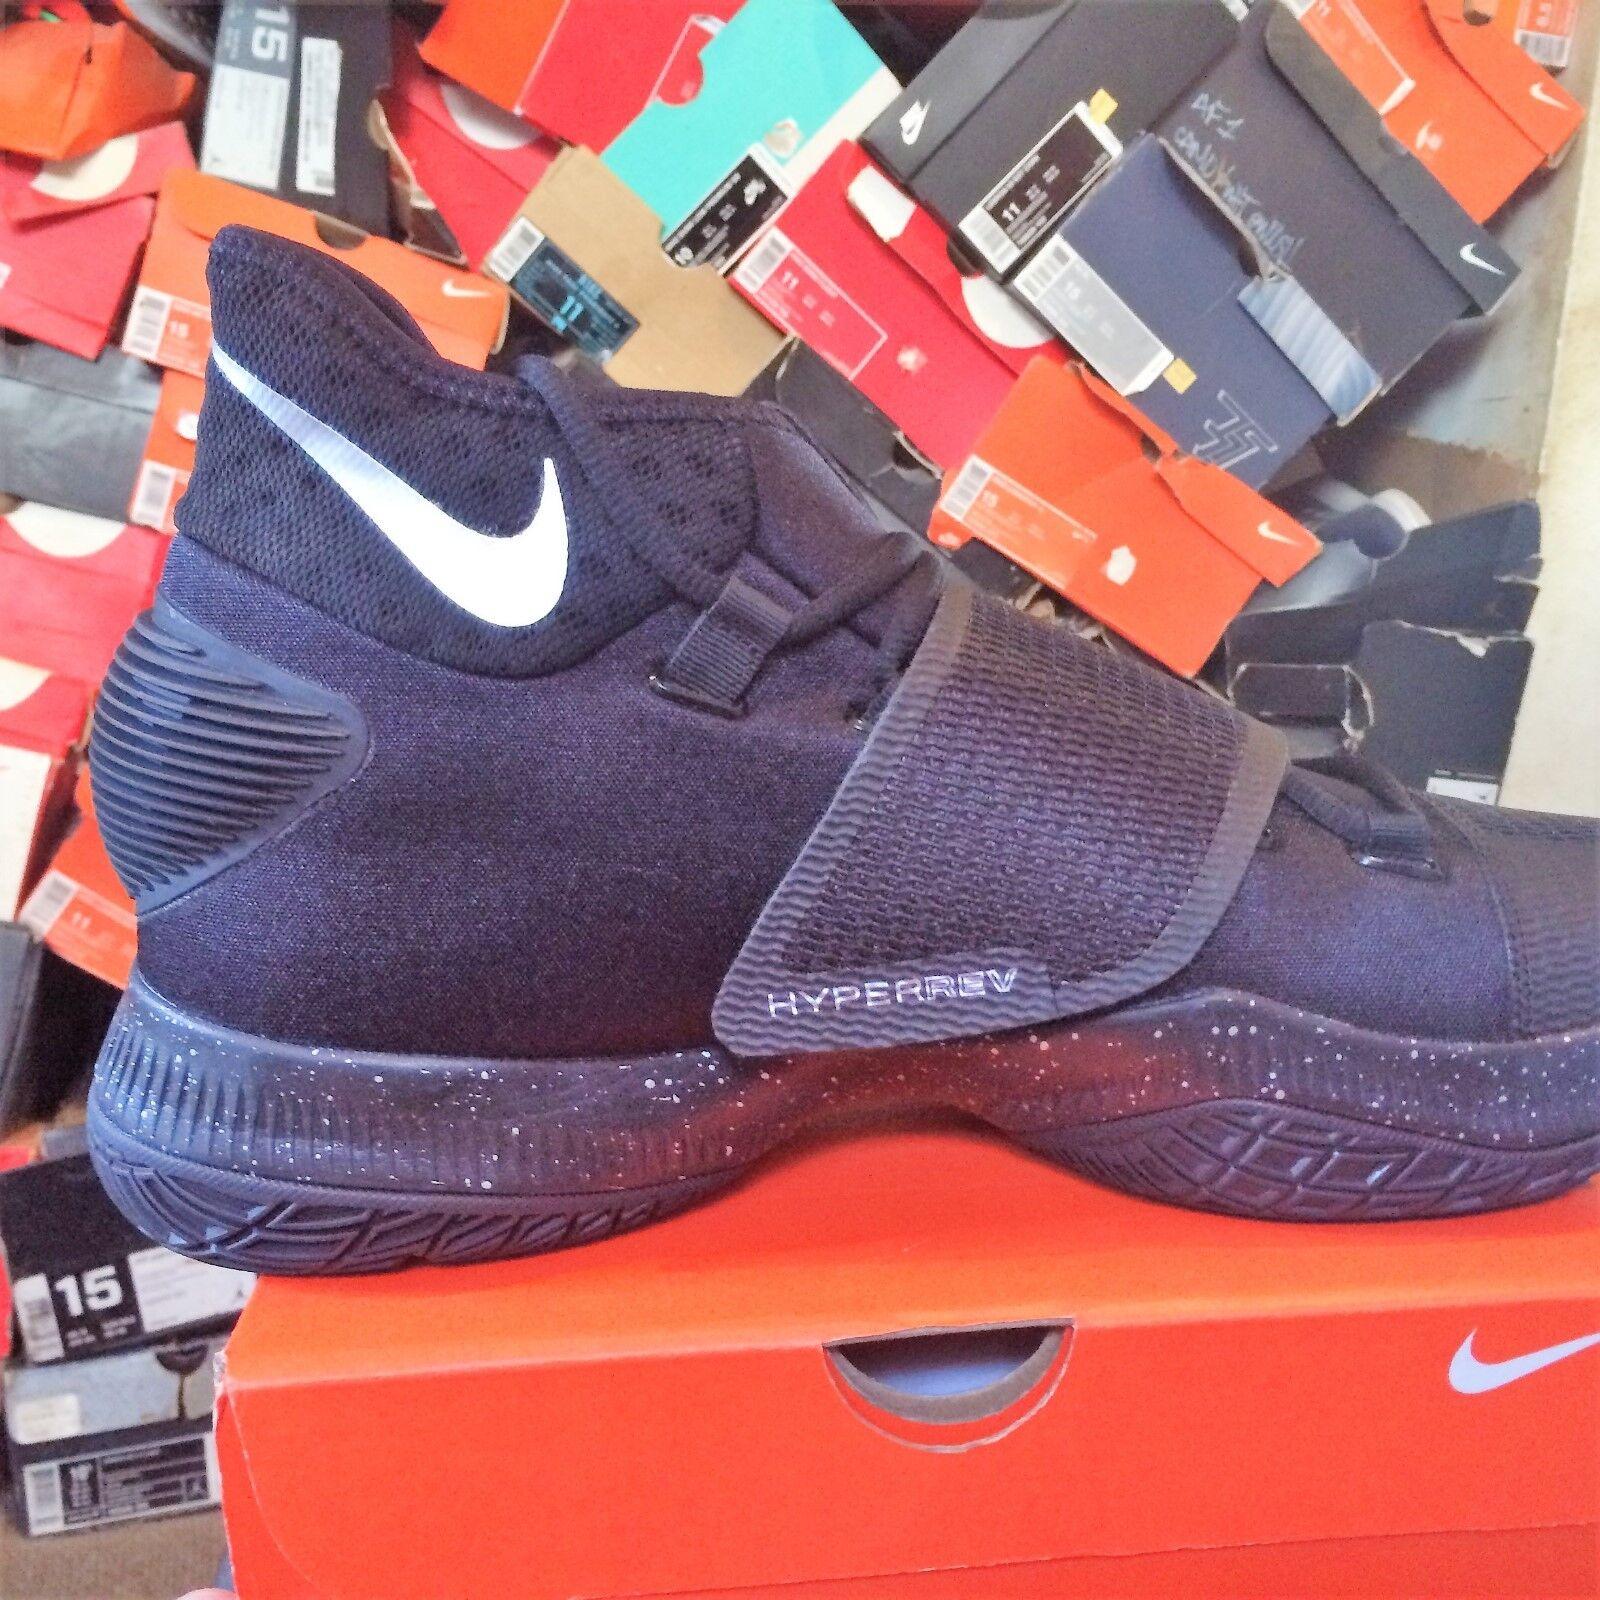 Nike Zoom hyperrev 2018 bnib tamaño BLK / BLK 820224 / SIL / blanco 820224 BLK 001 2f4de9